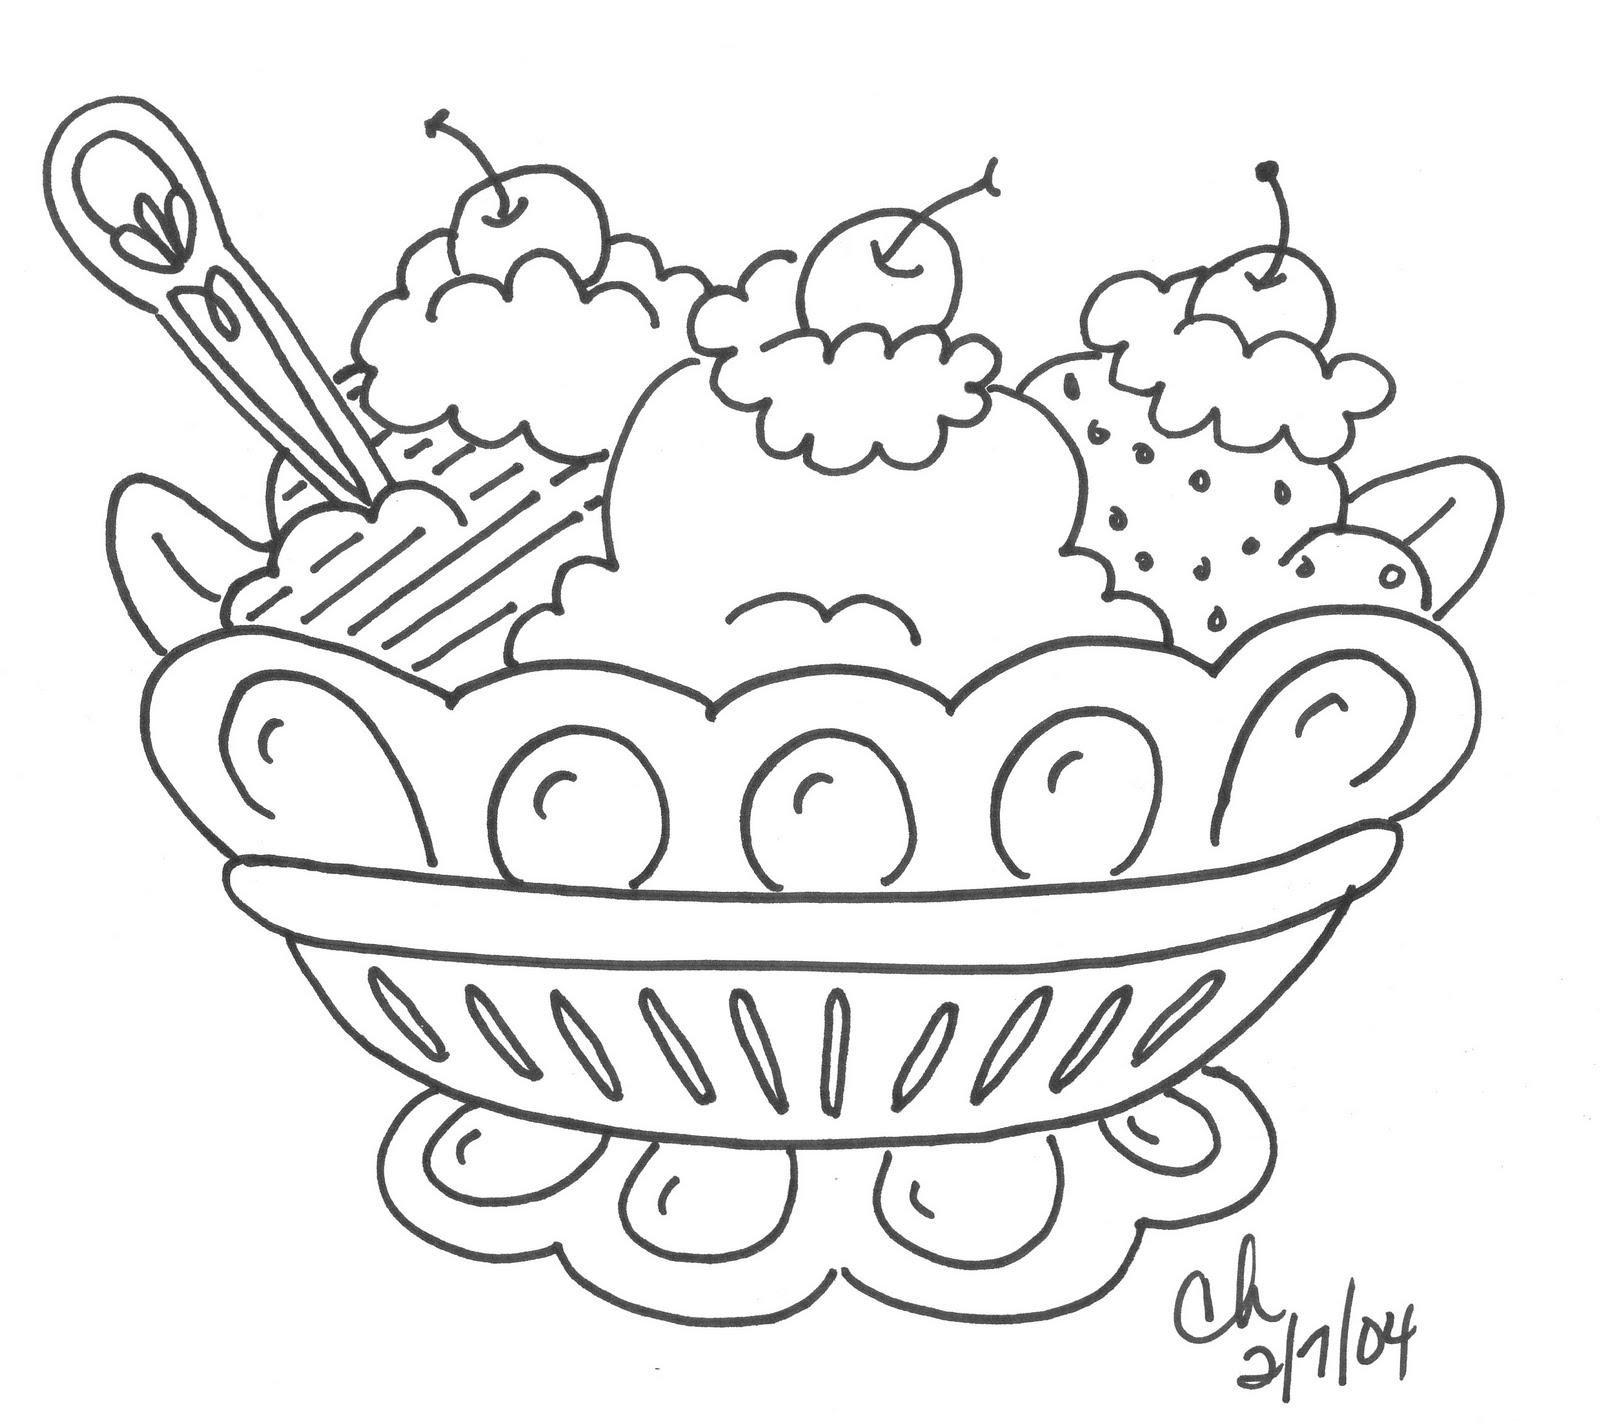 Free embroidery designs cute embroidery designs - Stitch Stitch Stitch Free Redwork Dessert